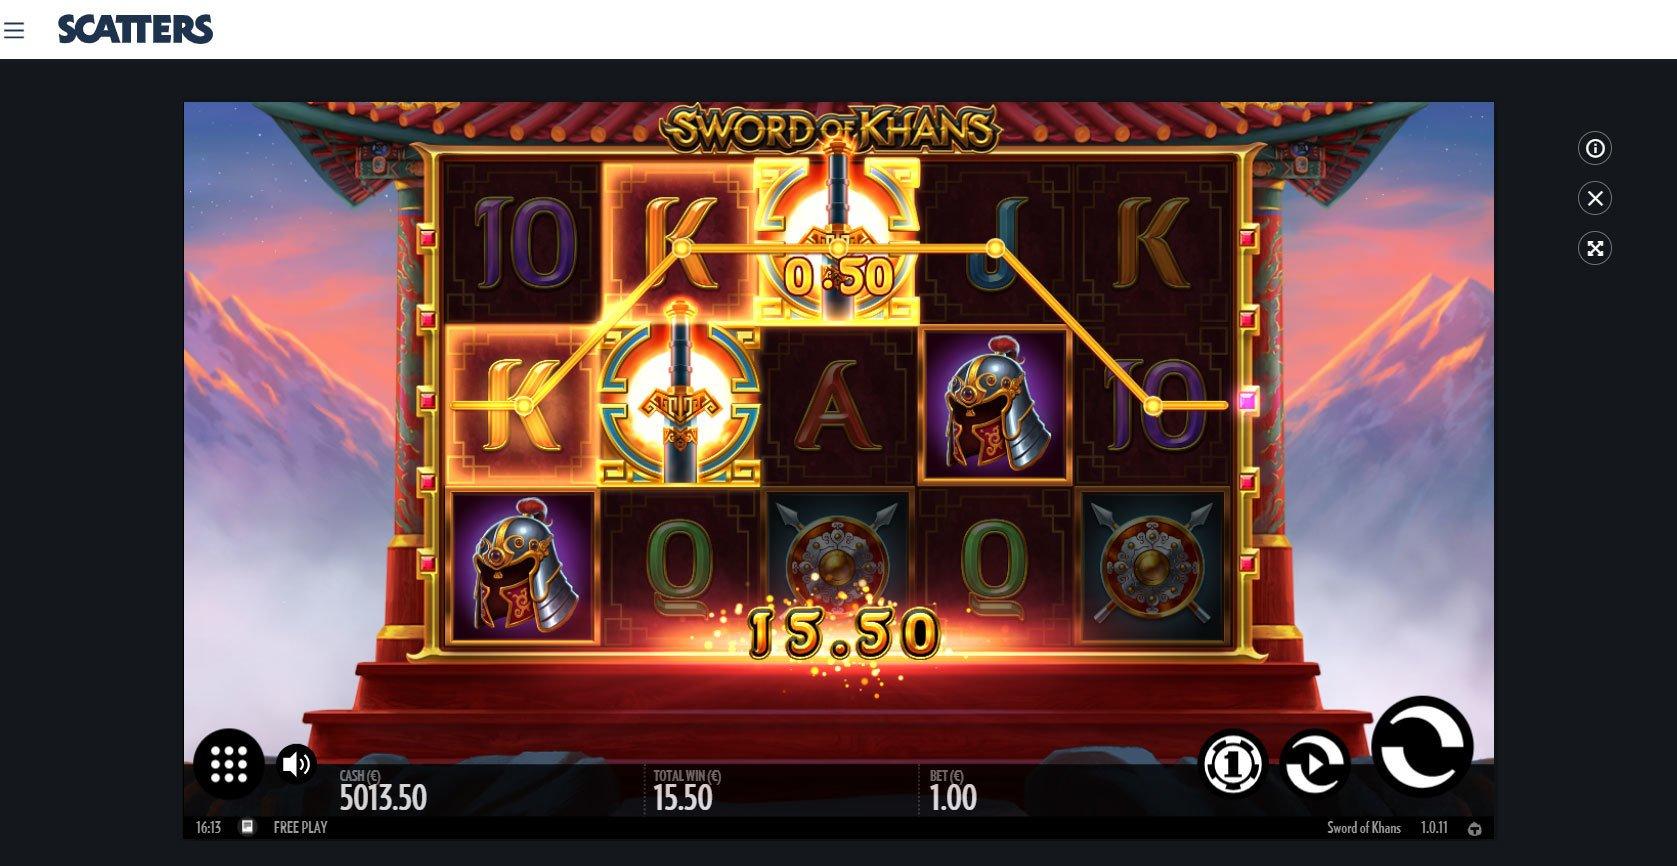 Sword of Khan Online Slot - Scatters Online Casino